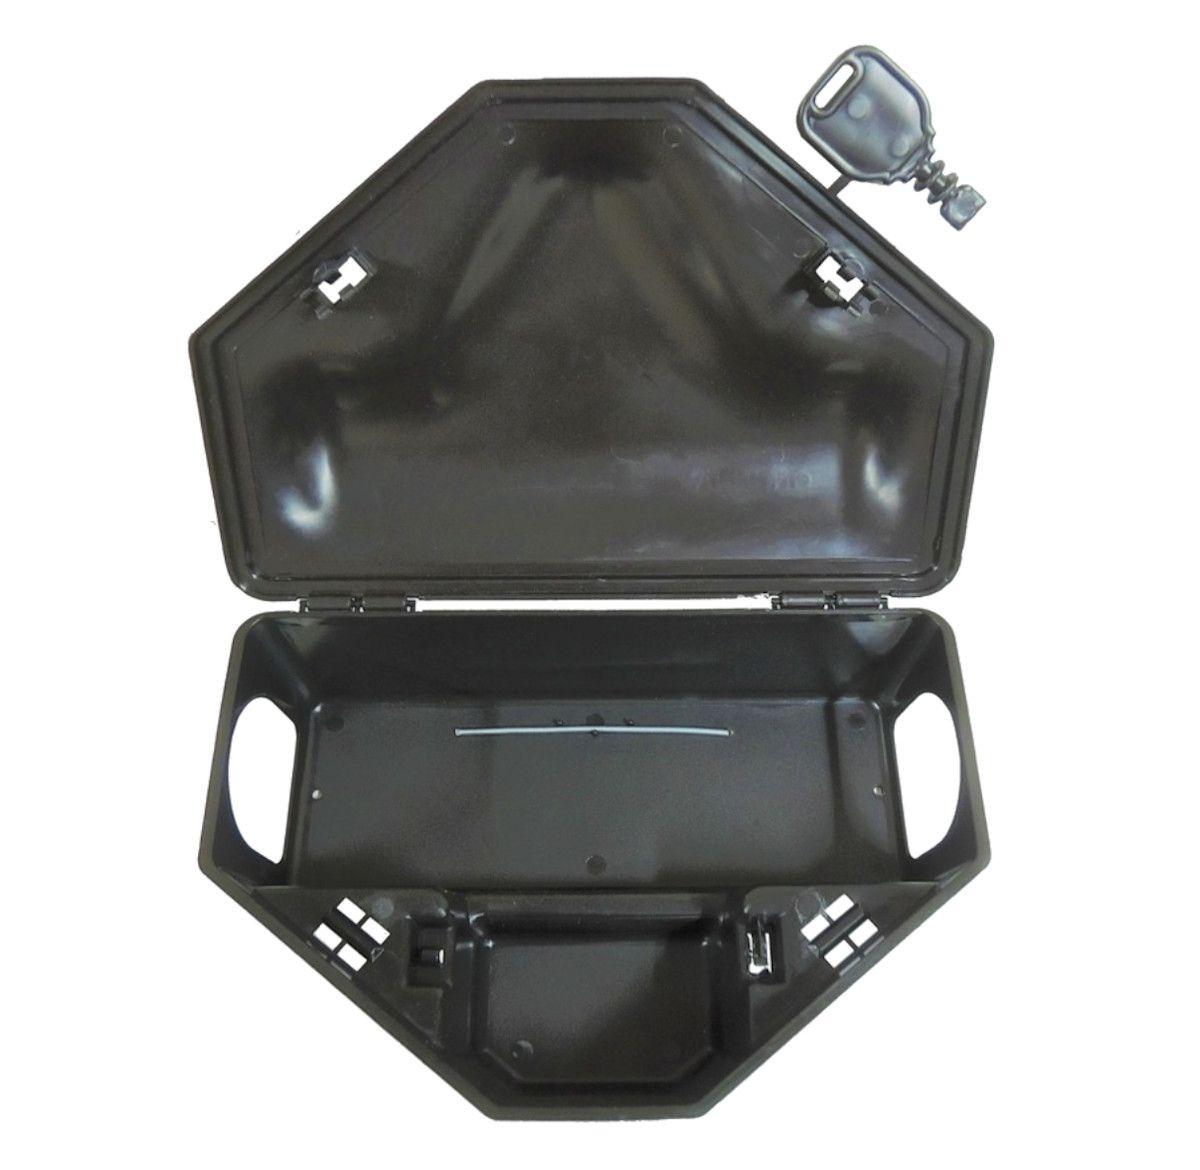 Kit 51 Porta Isca Com 2 Chaves - Duplo Travamento